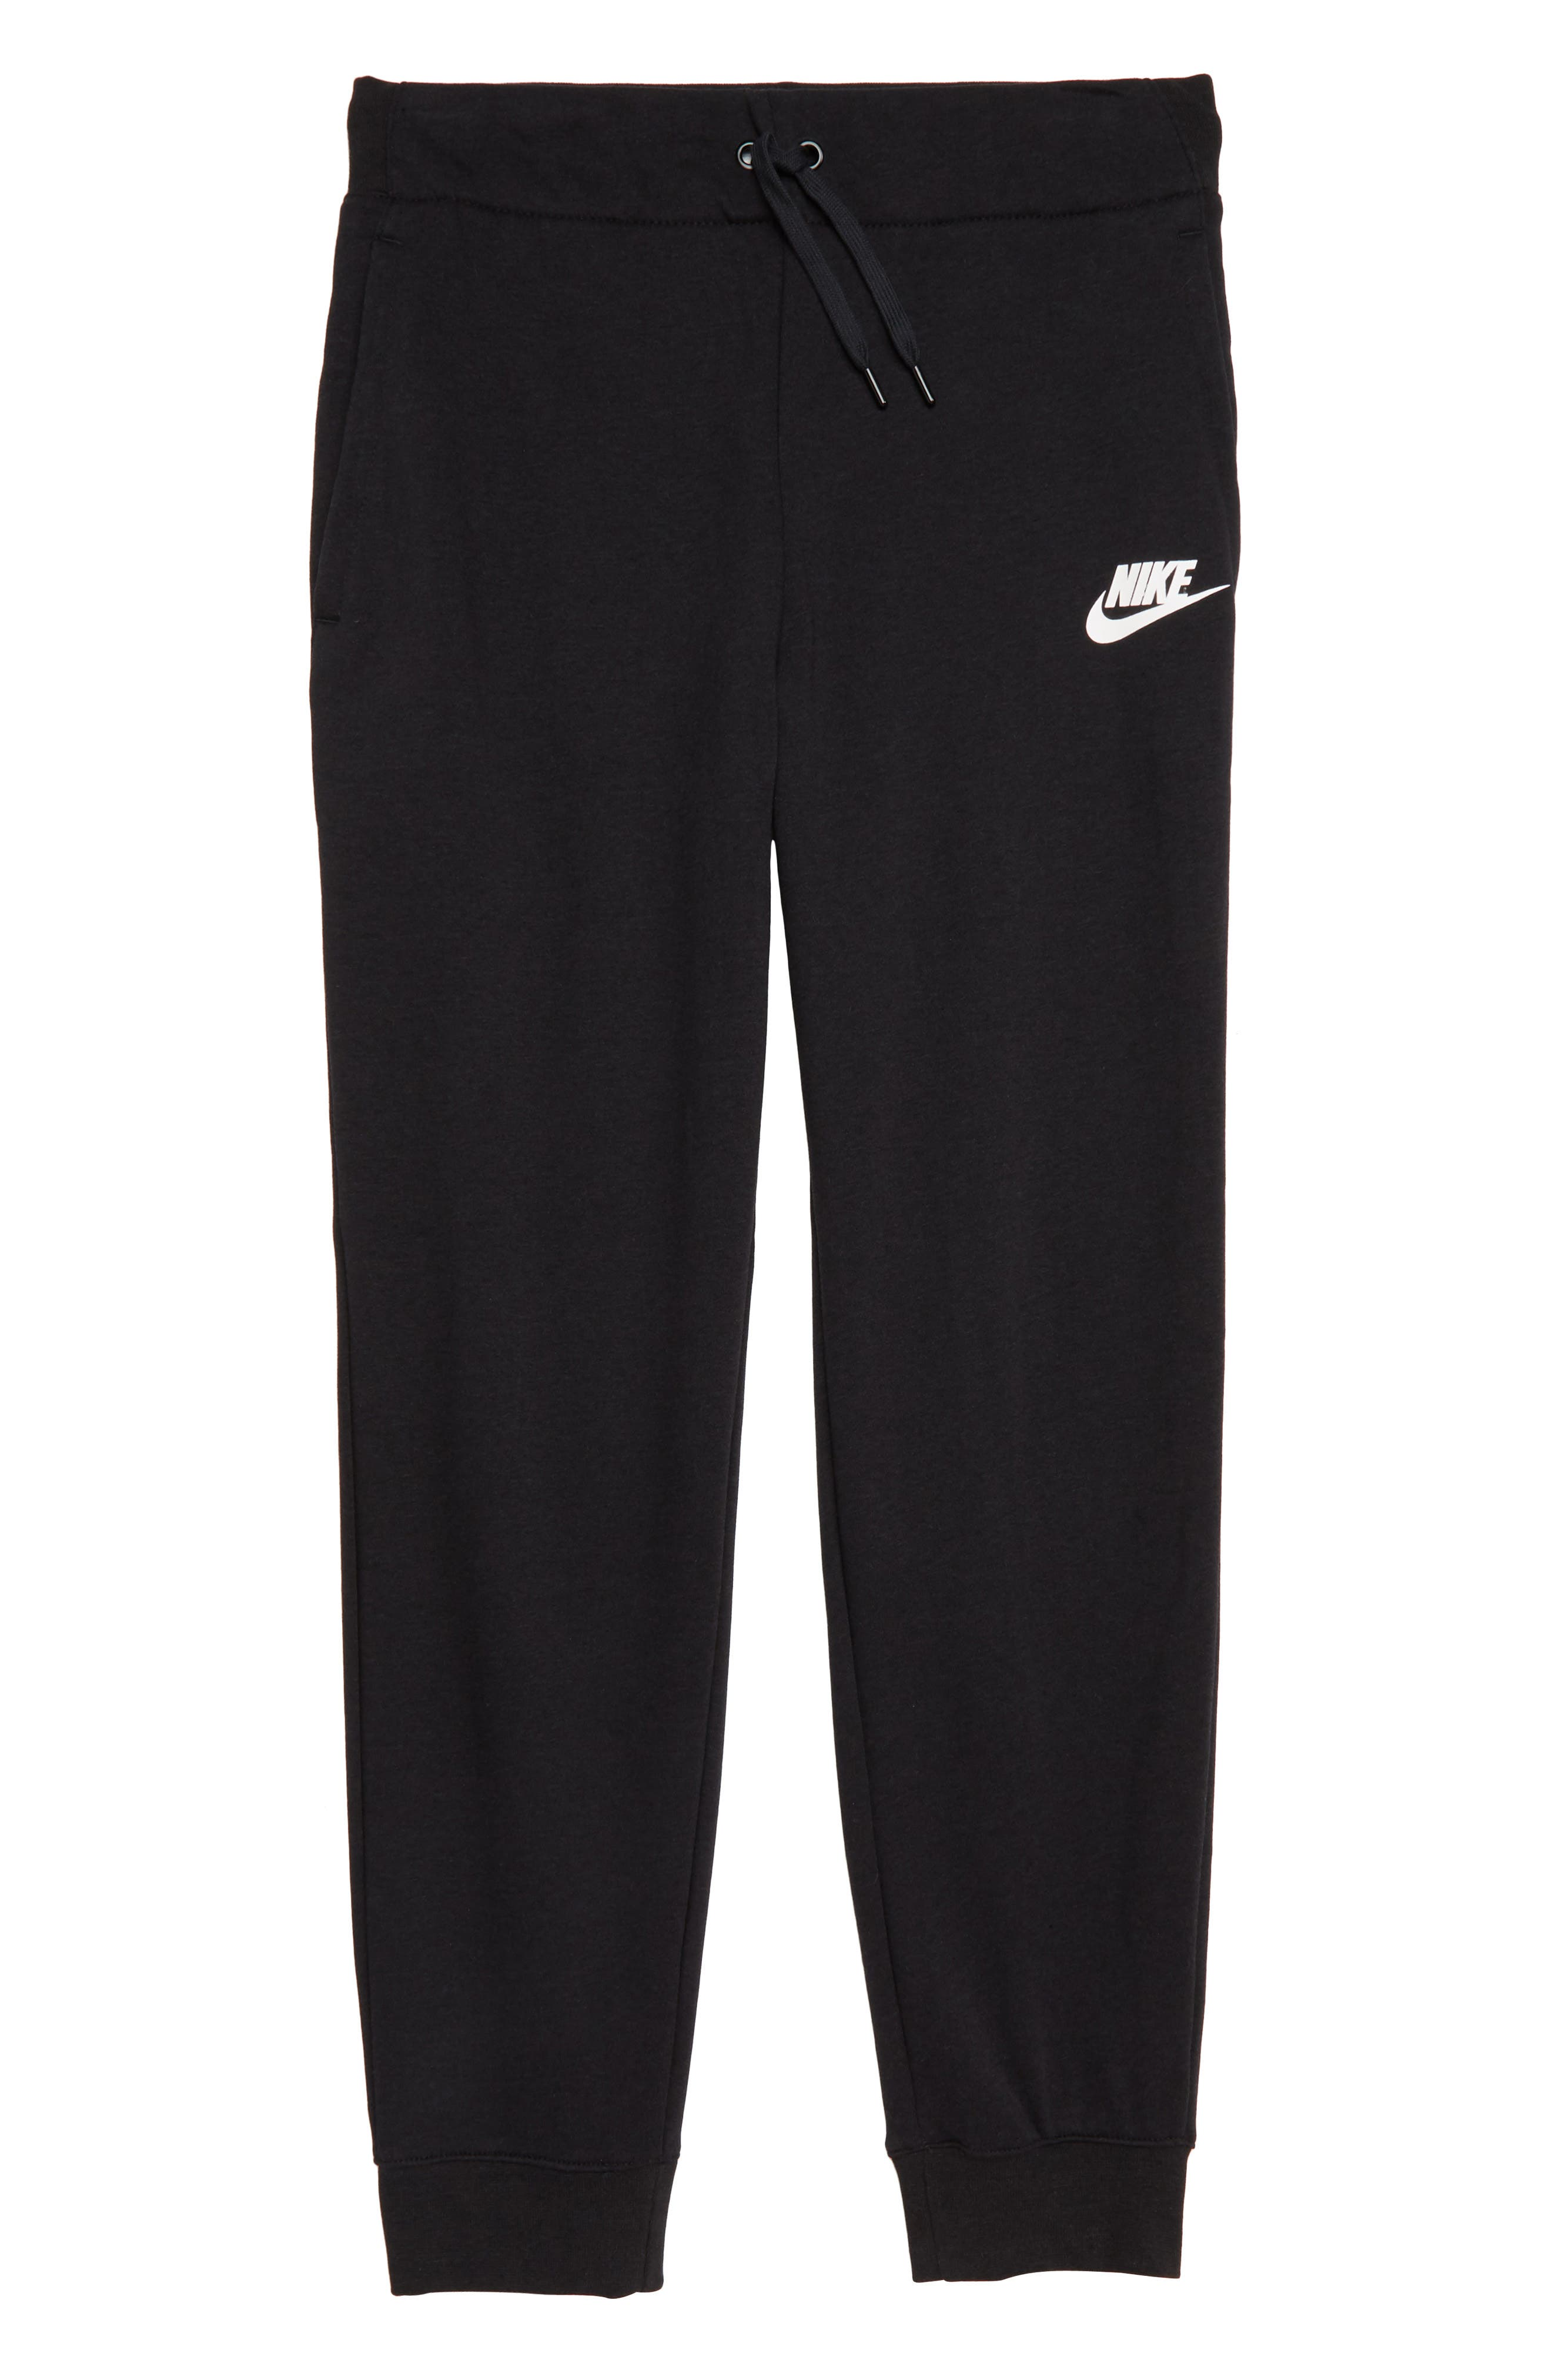 Sportswear PE Pants,                             Main thumbnail 1, color,                             BLACK/ WHITE